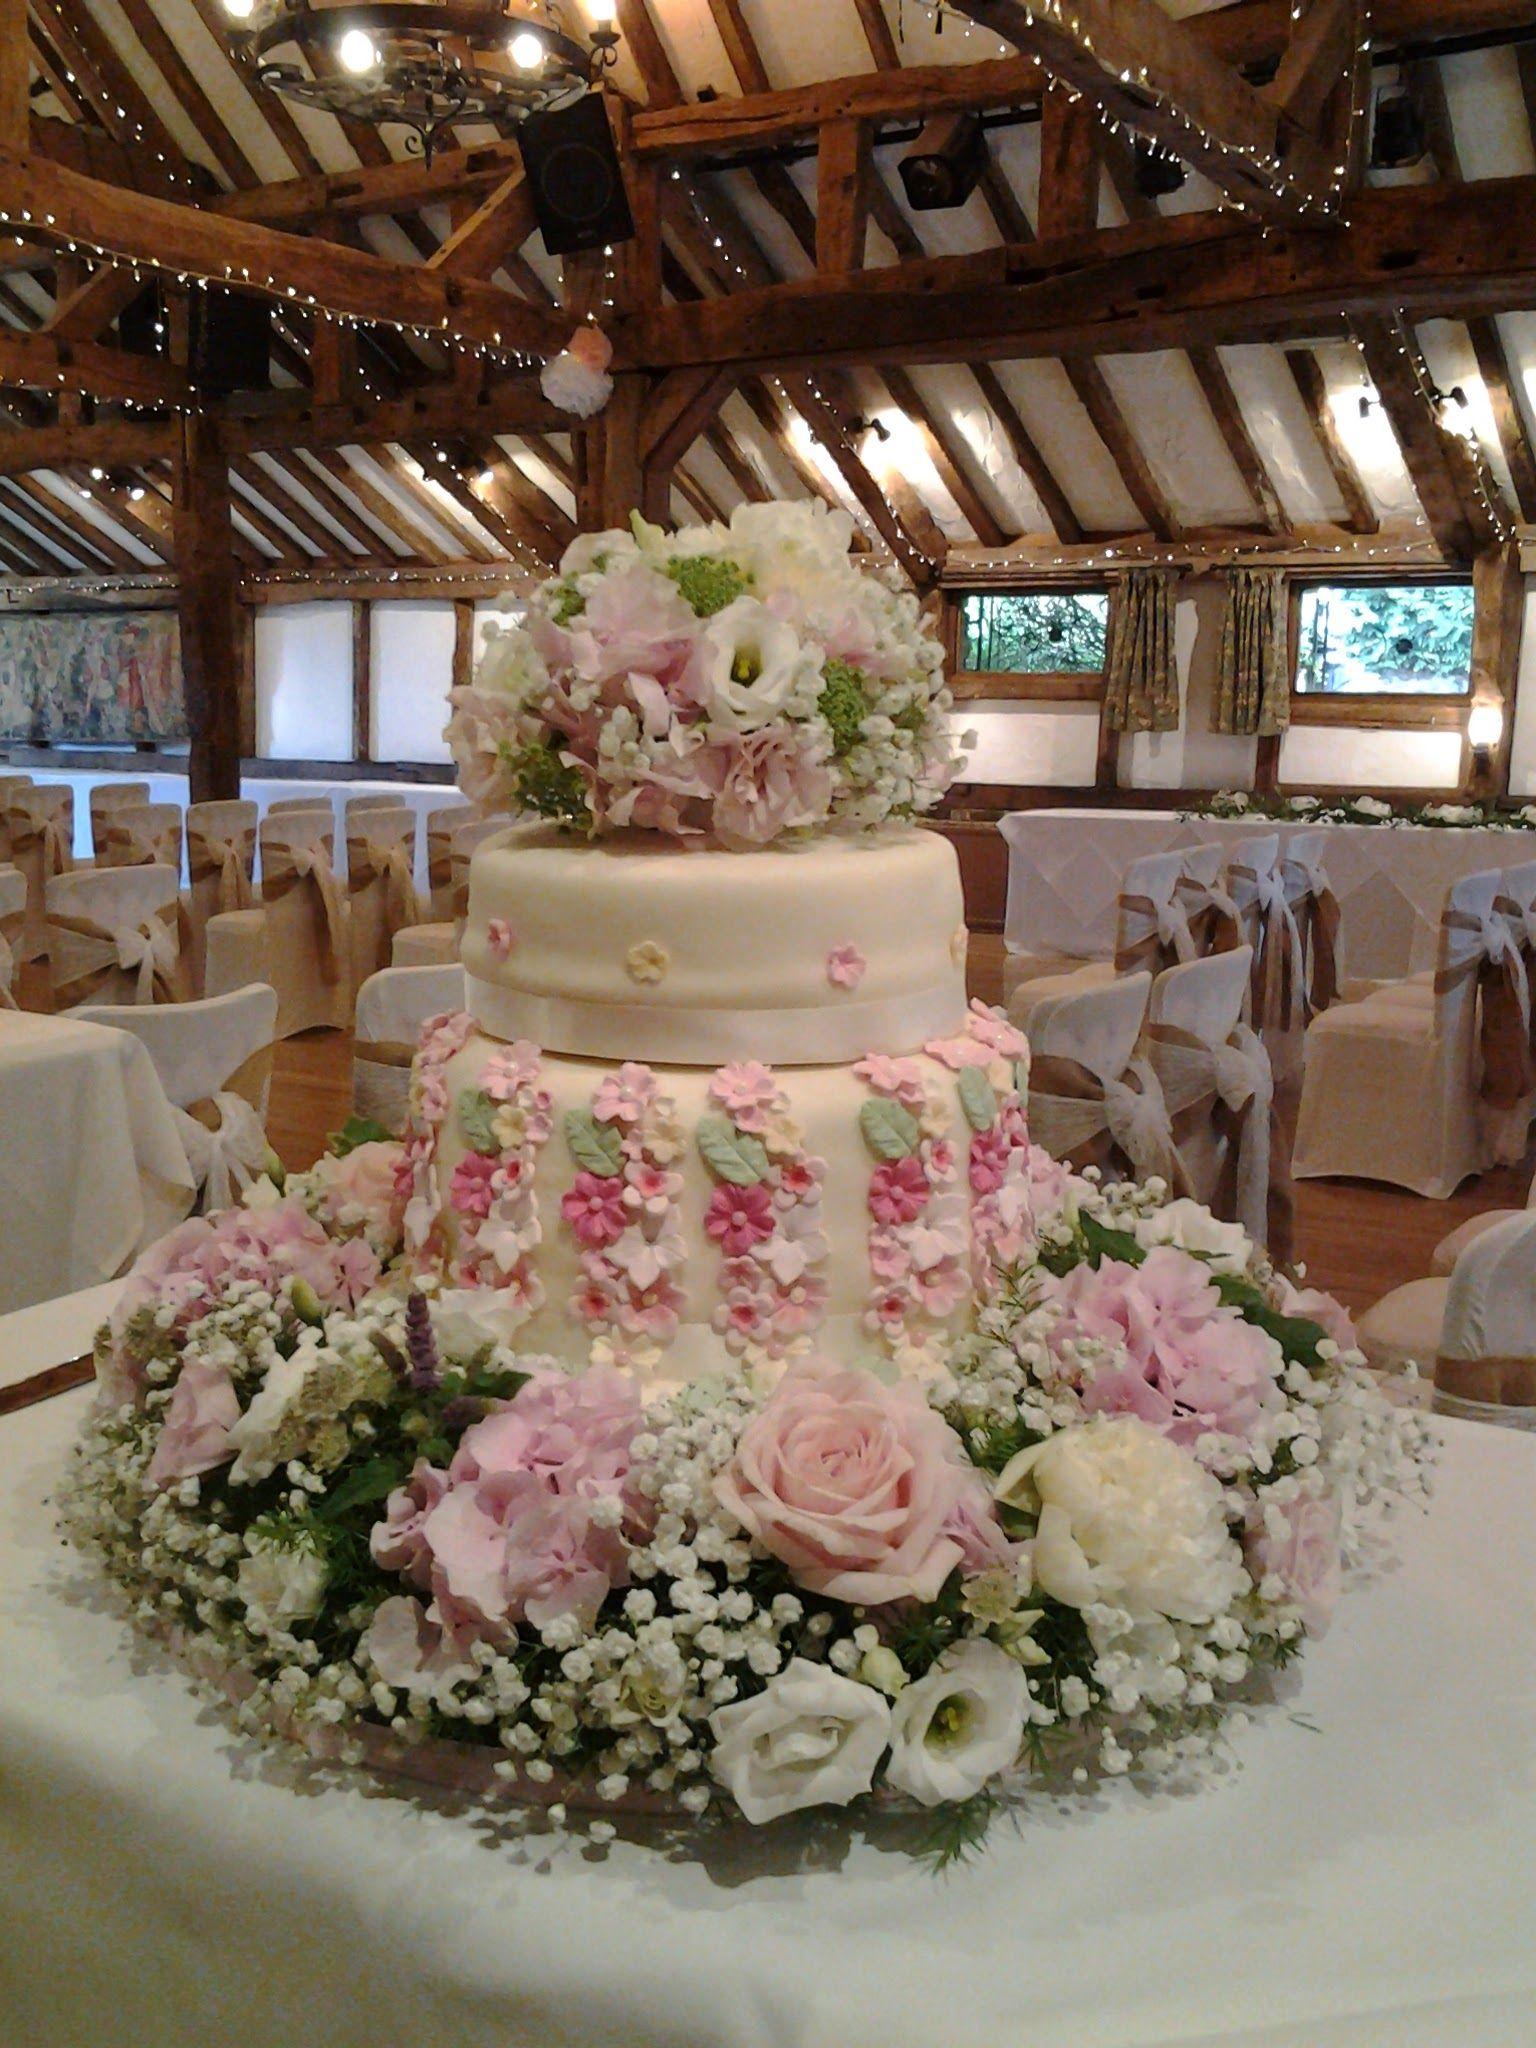 Ridiculously stunning, lavish cake flowers for a bespoke